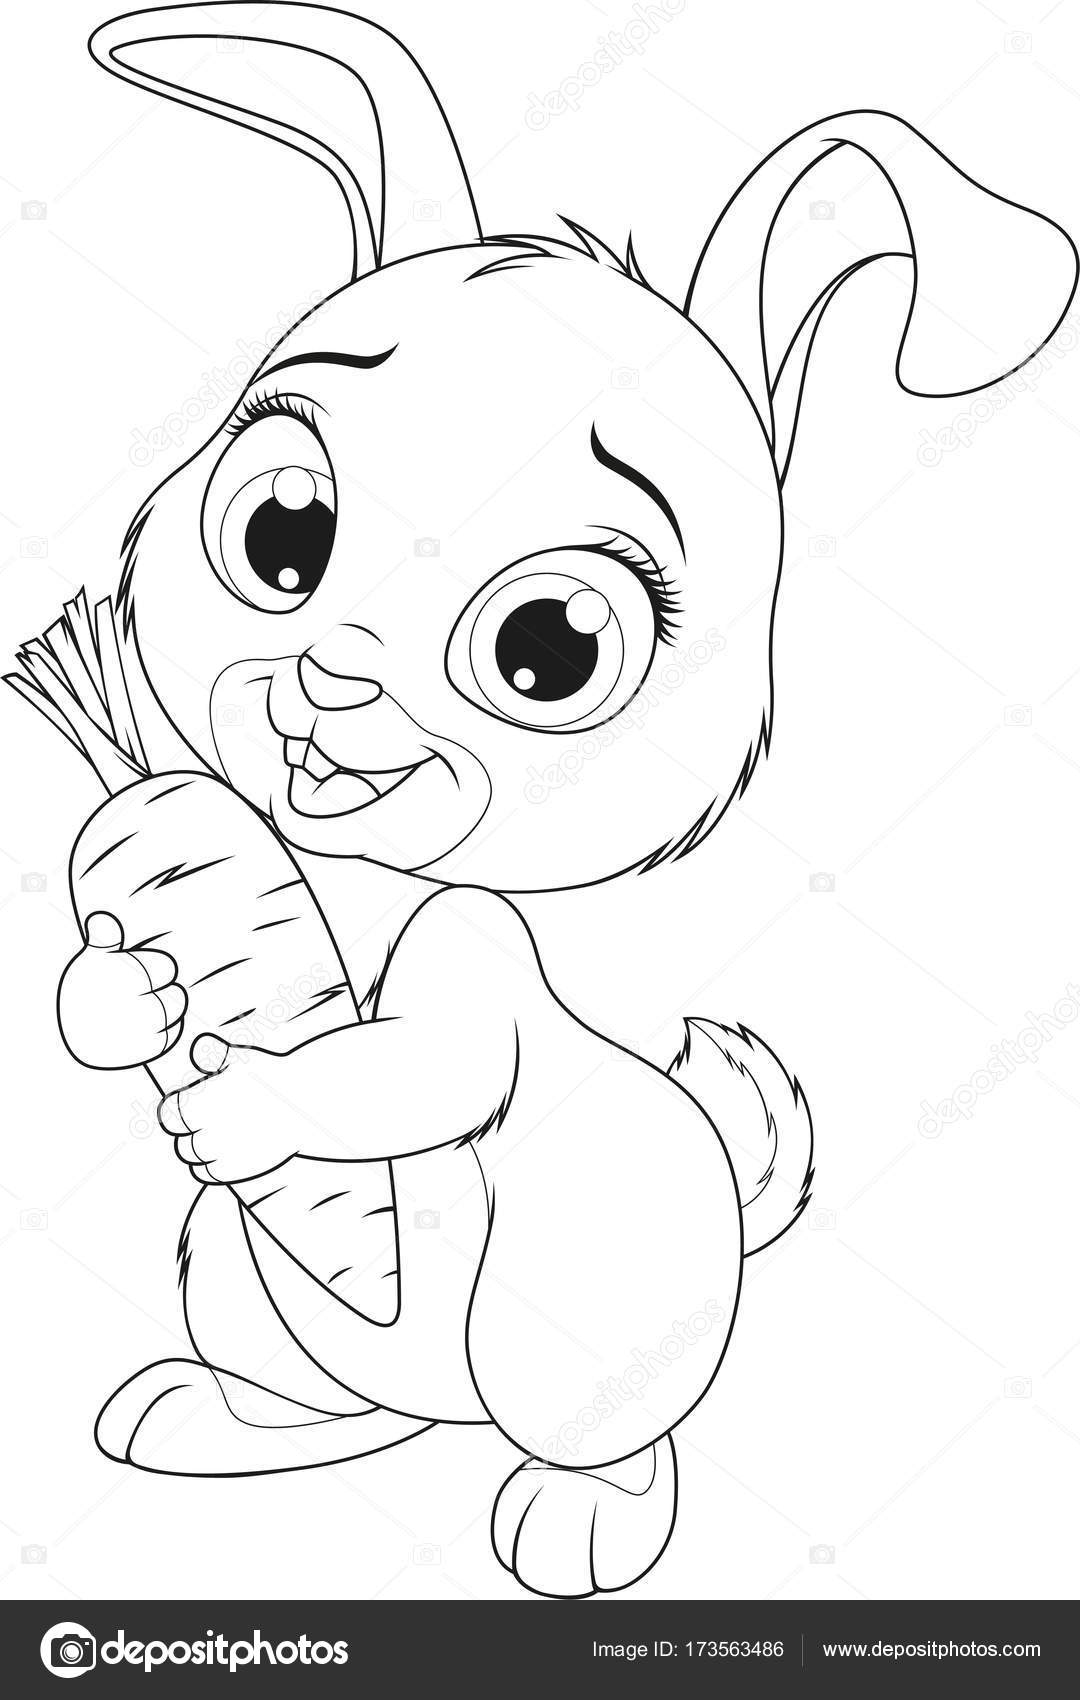 Kleine lustige Hase — Stockvektor © Andrey_Makurin #173563486